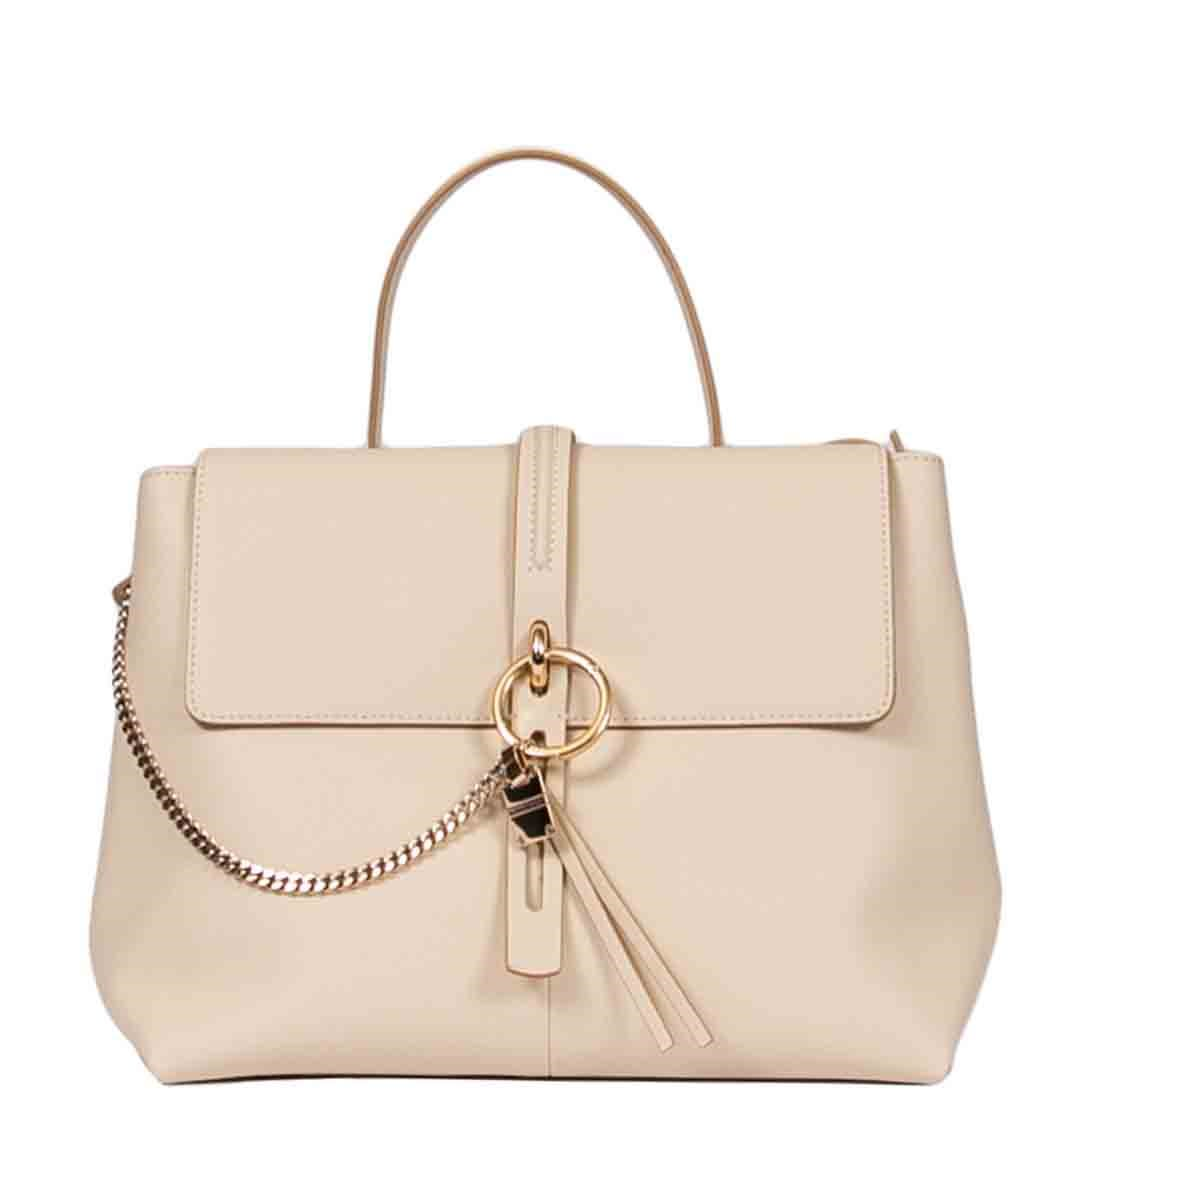 Medium Top Handle Bag